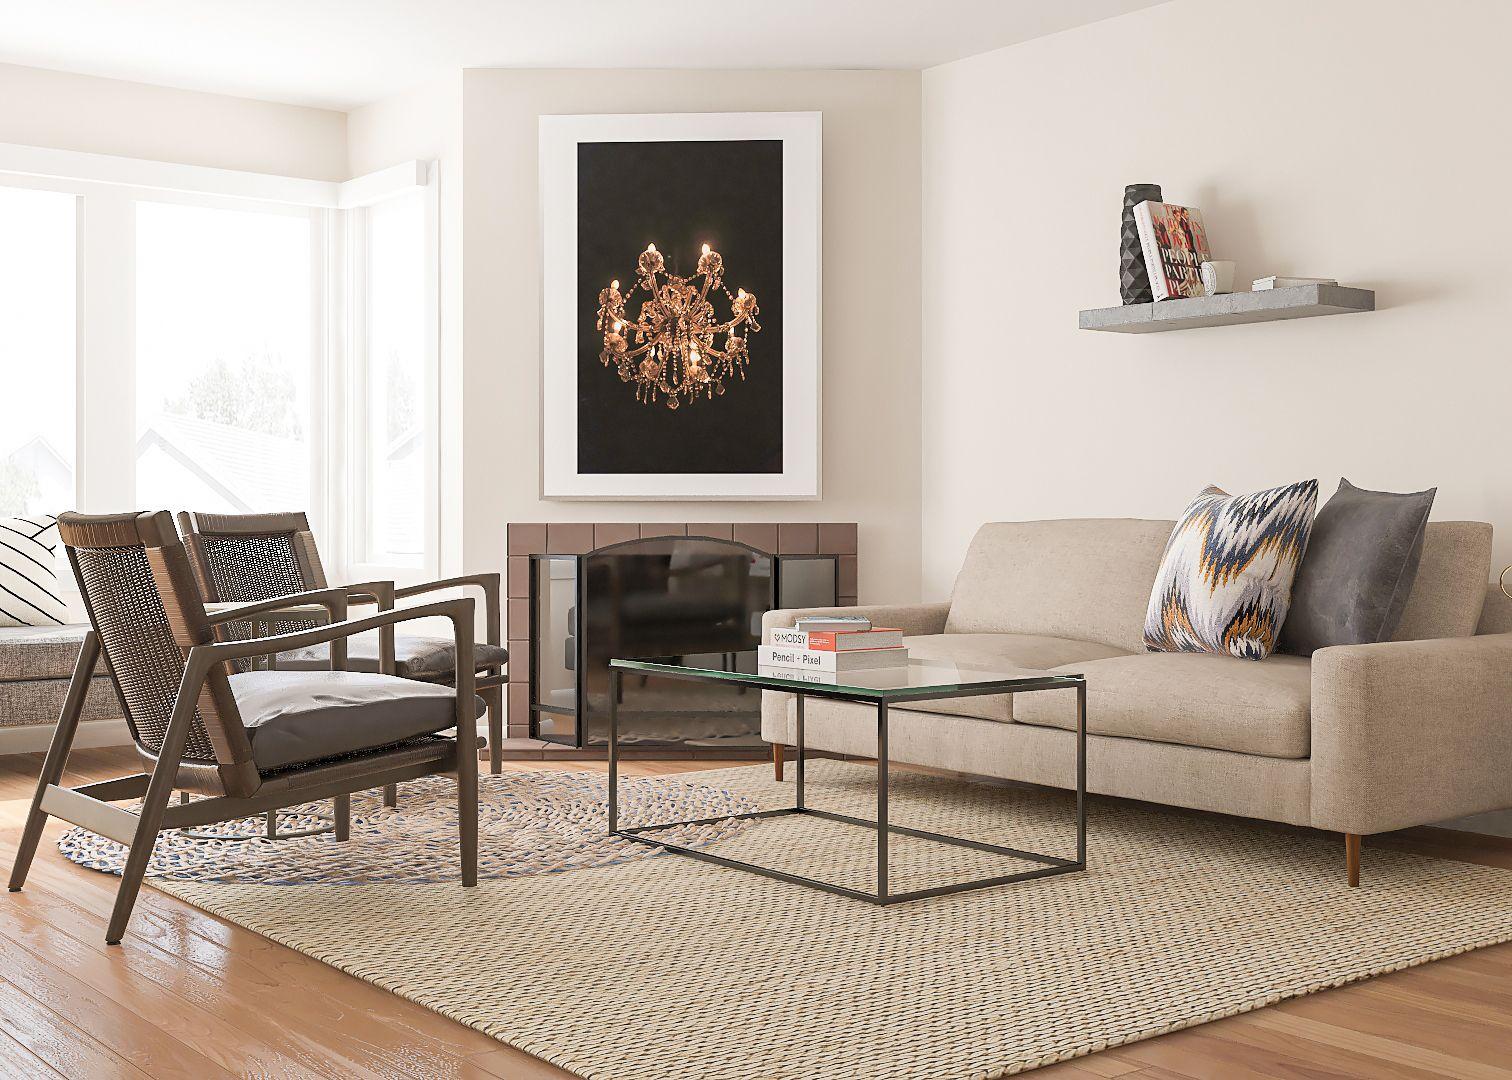 Contemporary and comfortable living room design ideas | Contemporary ...